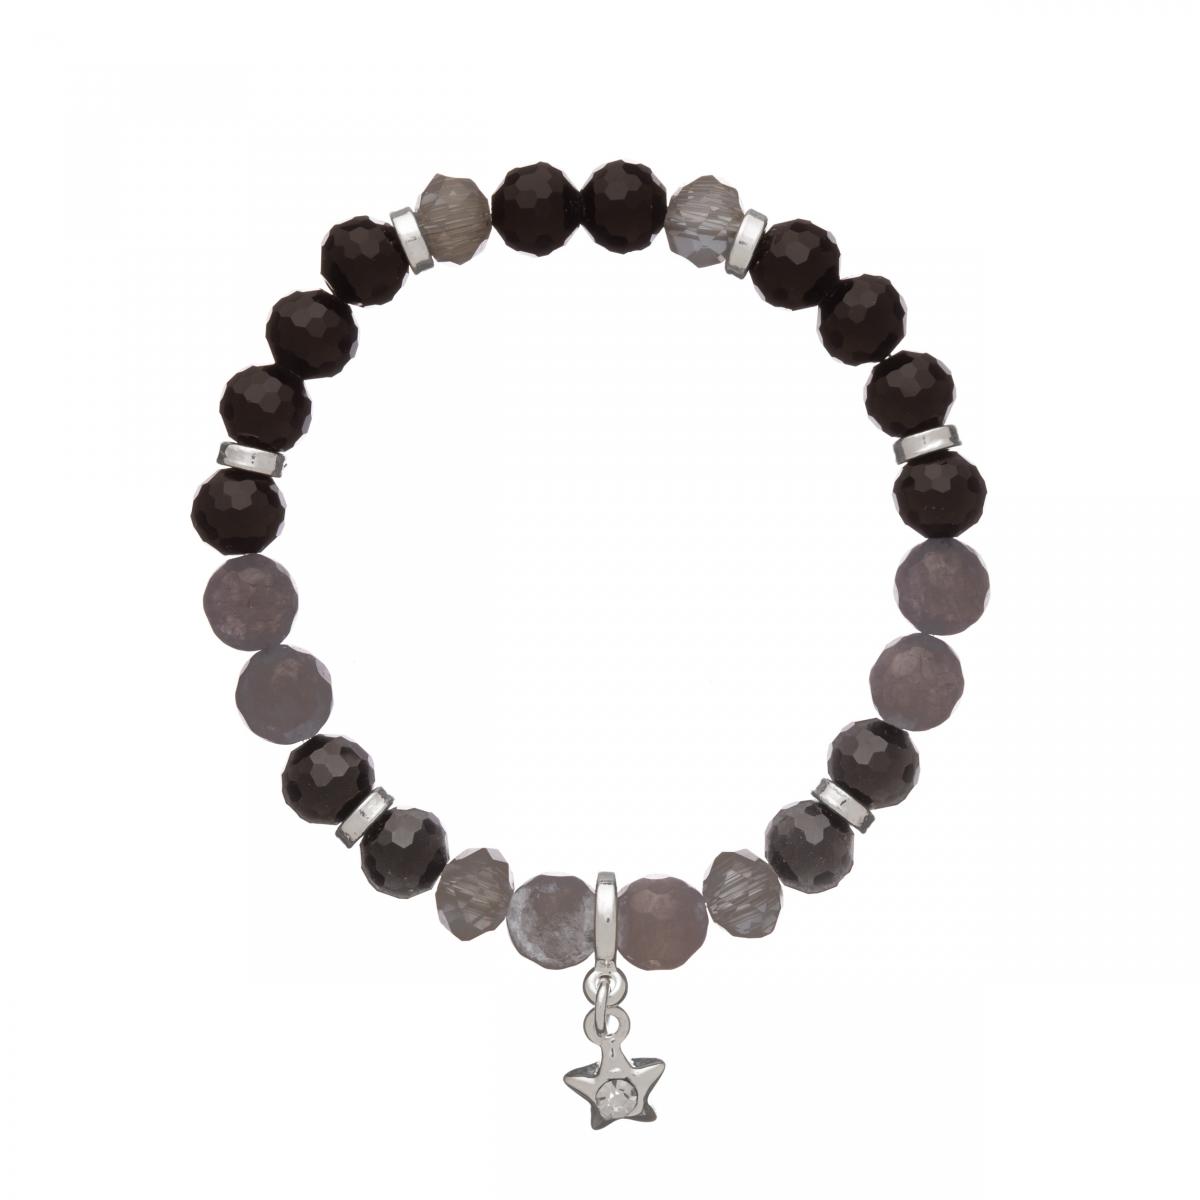 Náramok Mineral Facet Black Onyx &  Grey Jadeit Silver Star